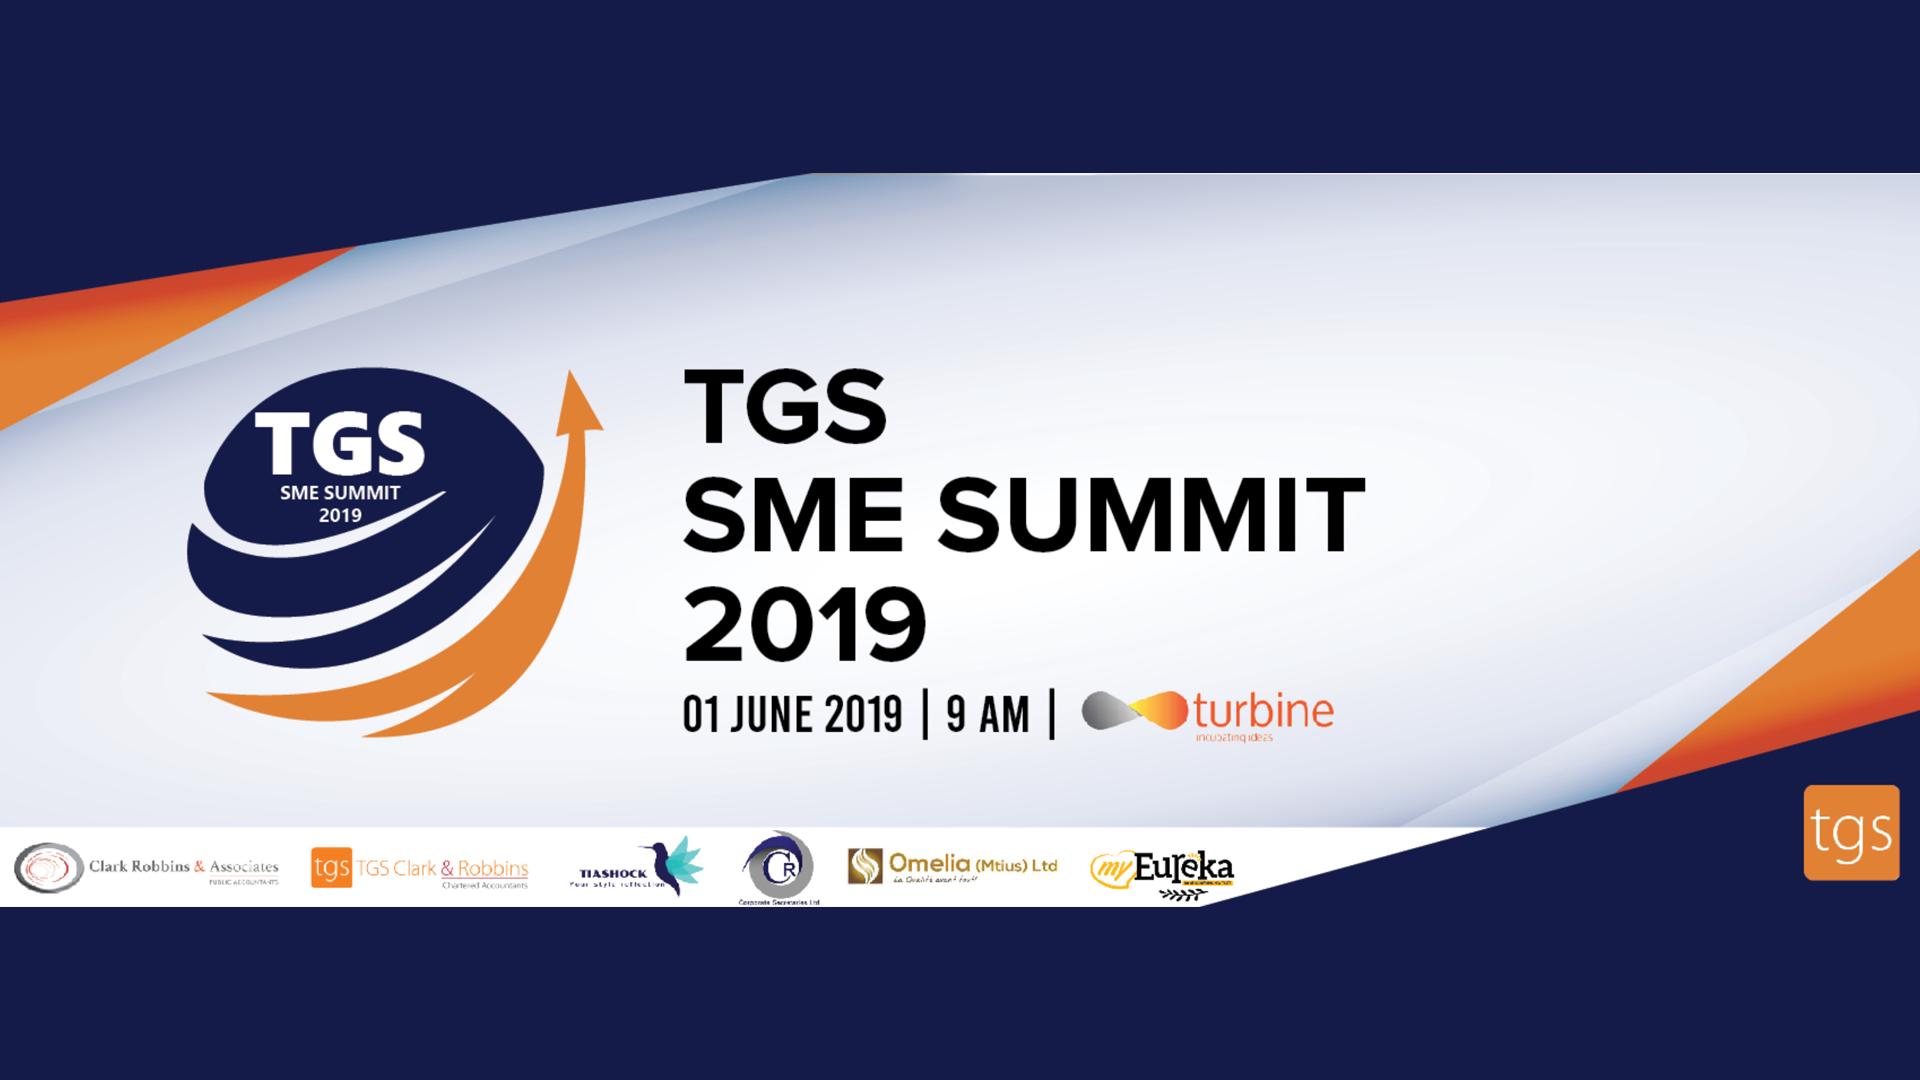 tgs-sme-summit